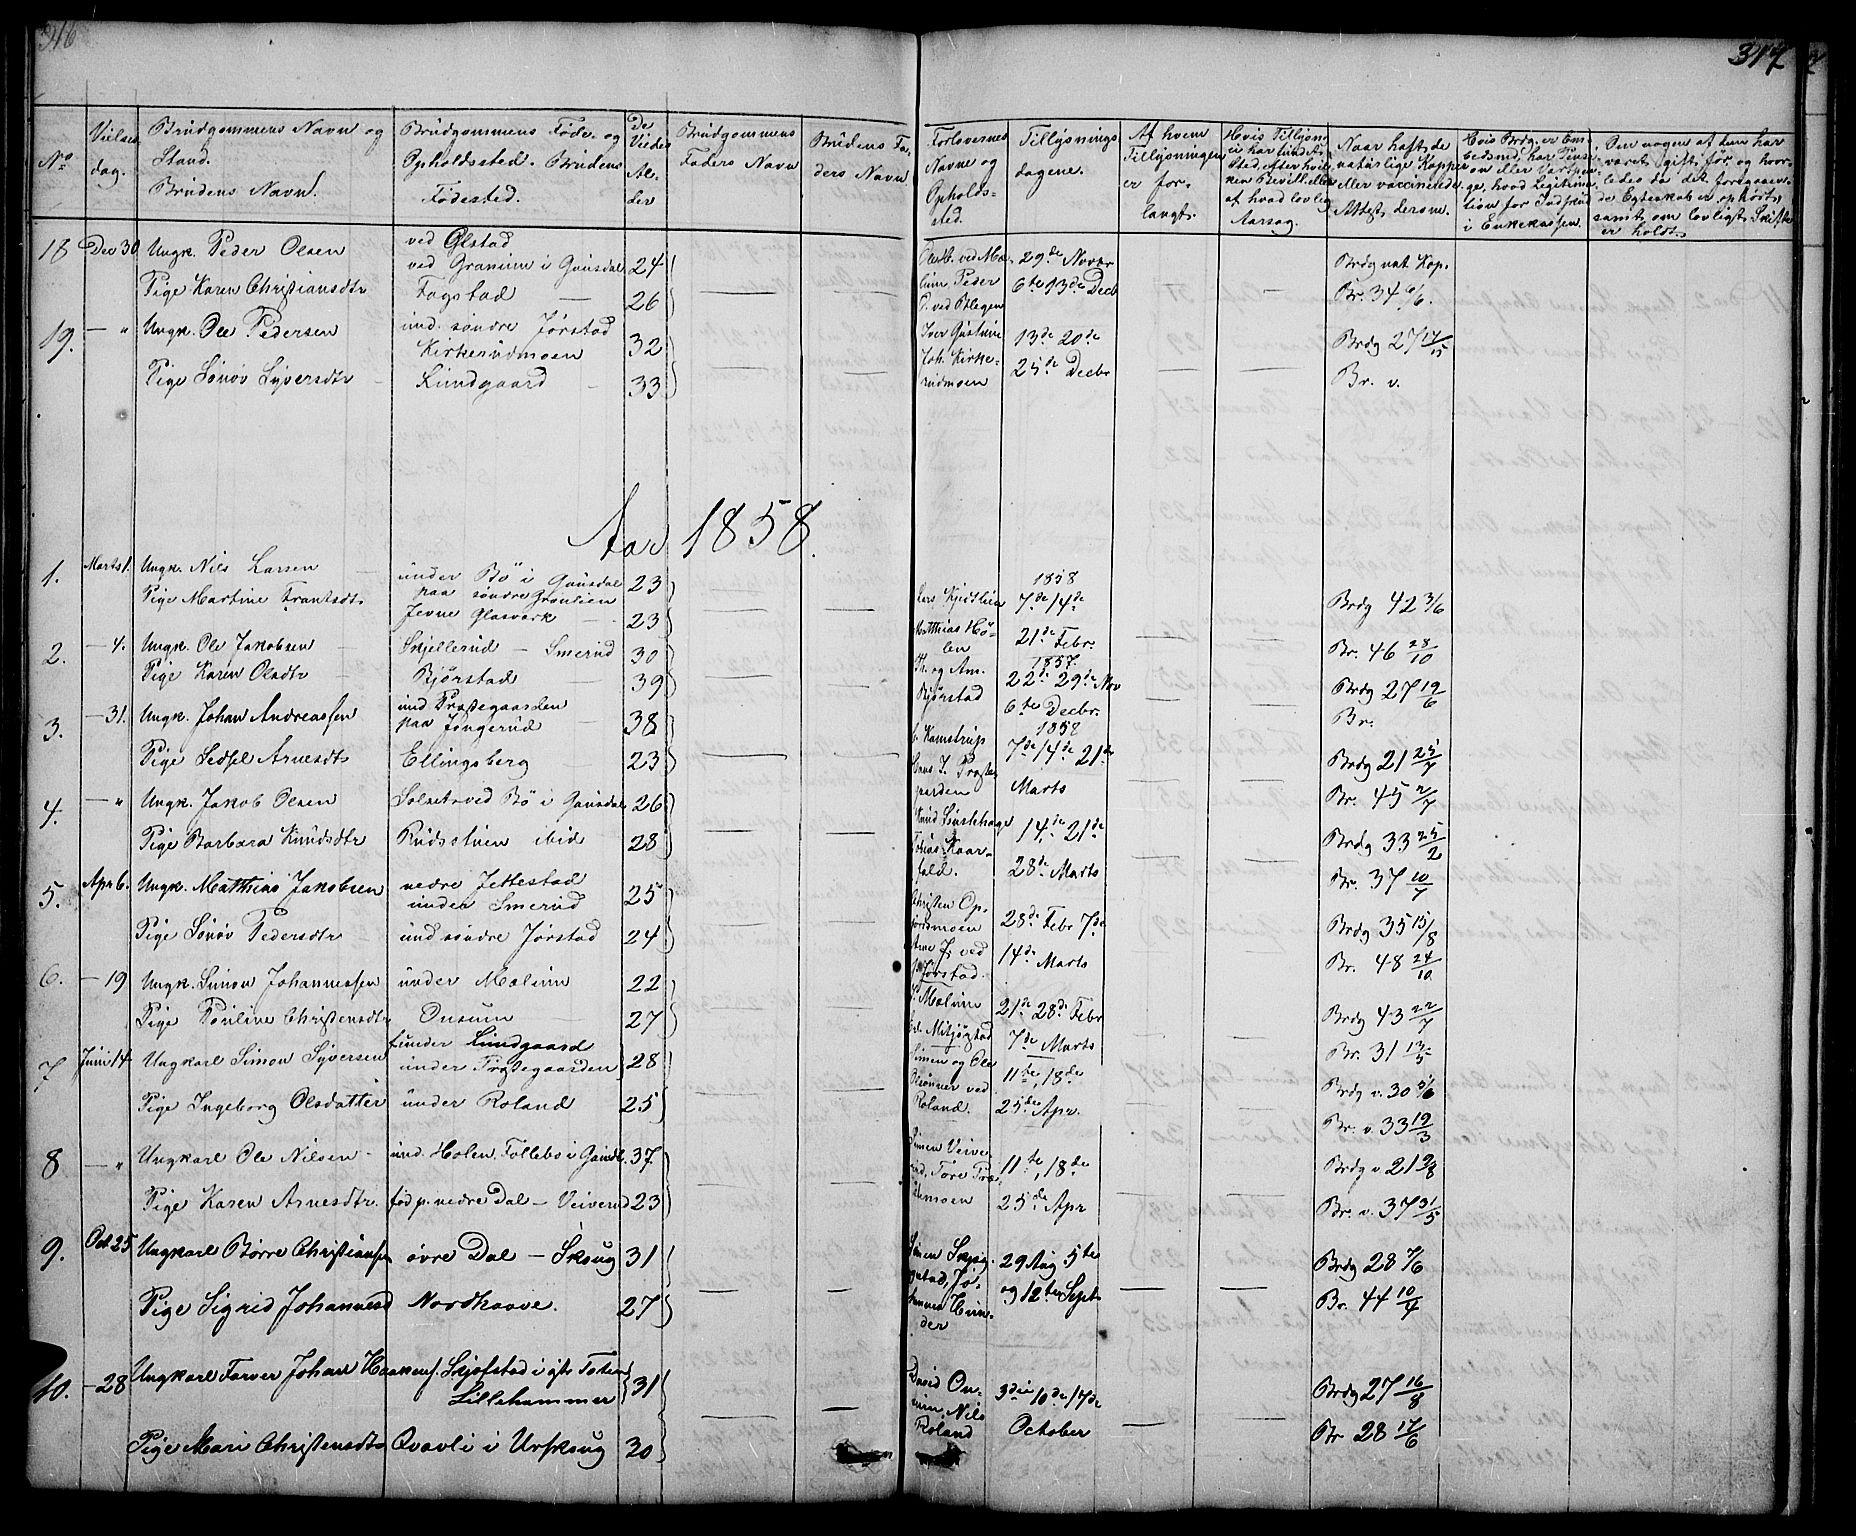 SAH, Fåberg prestekontor, Klokkerbok nr. 5, 1837-1864, s. 316-317